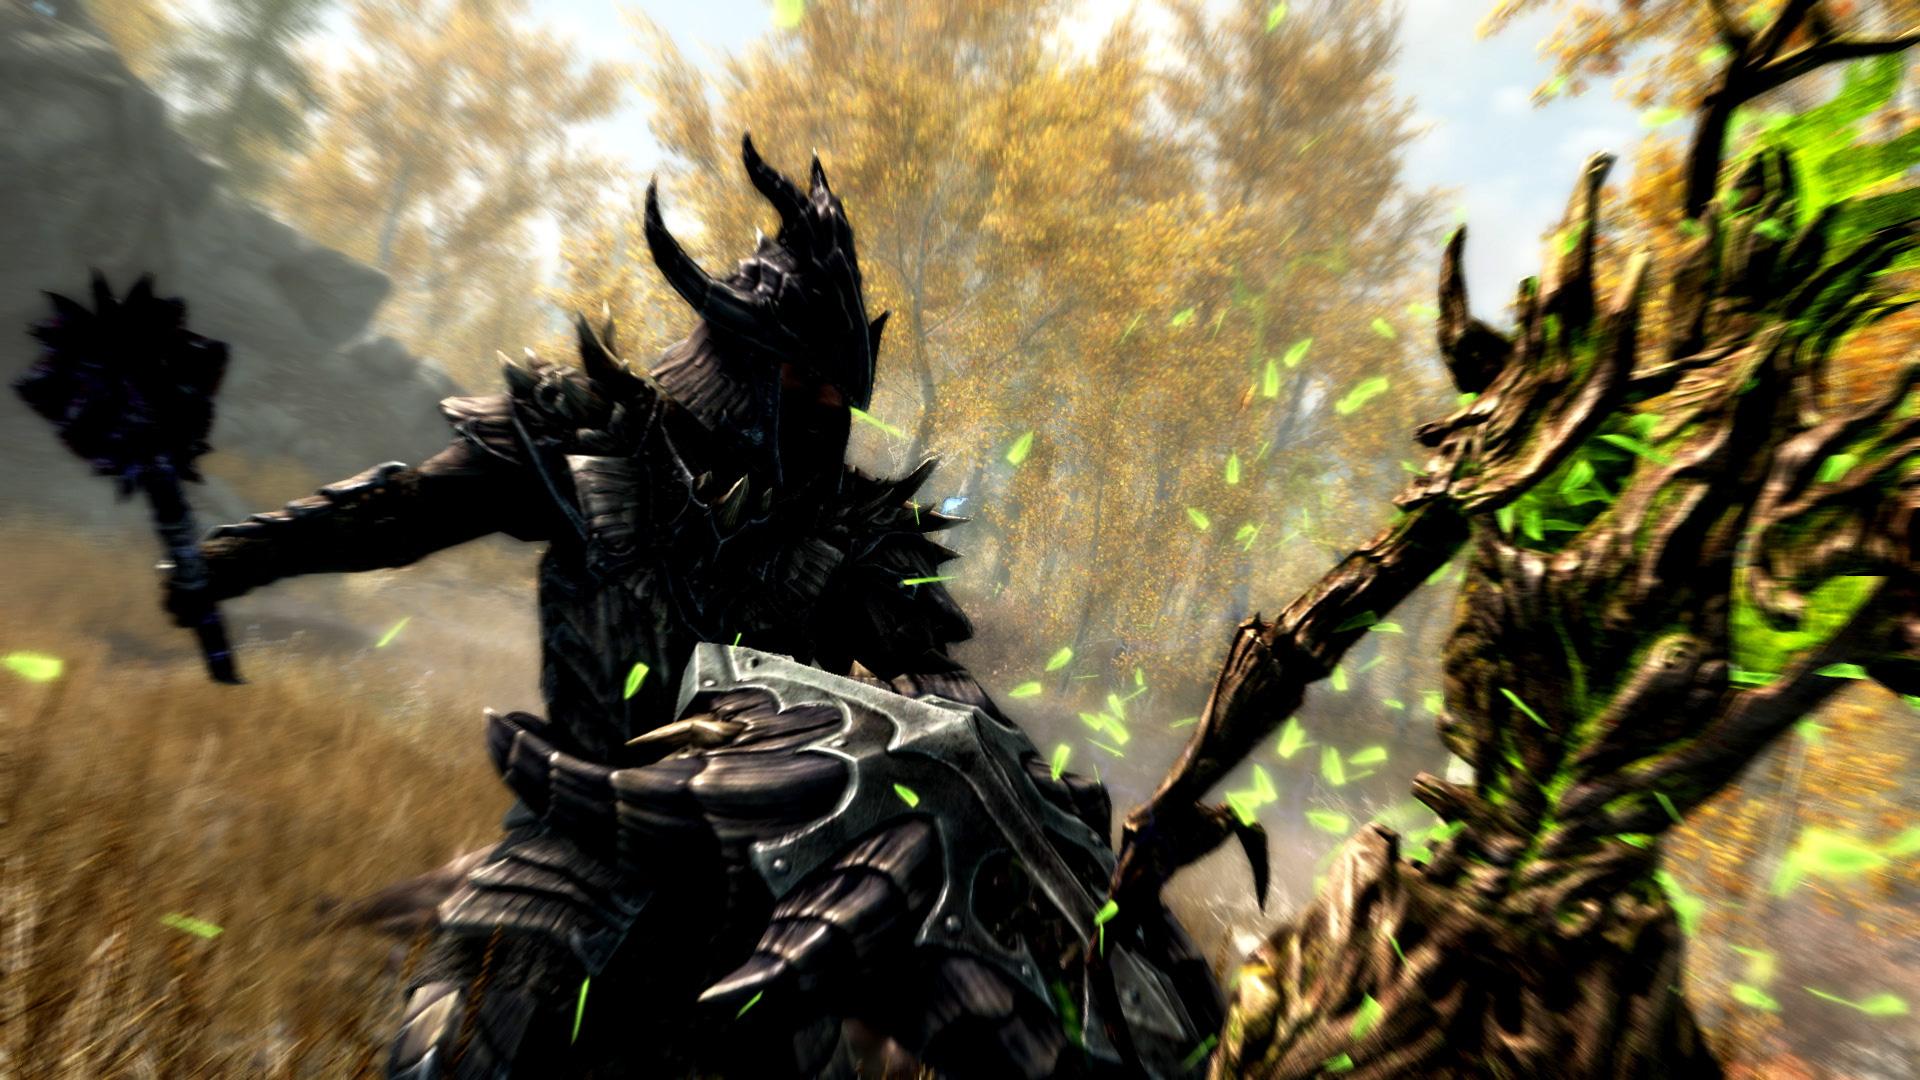 The Elder Scrolls Skyrim Special Edition Free Download